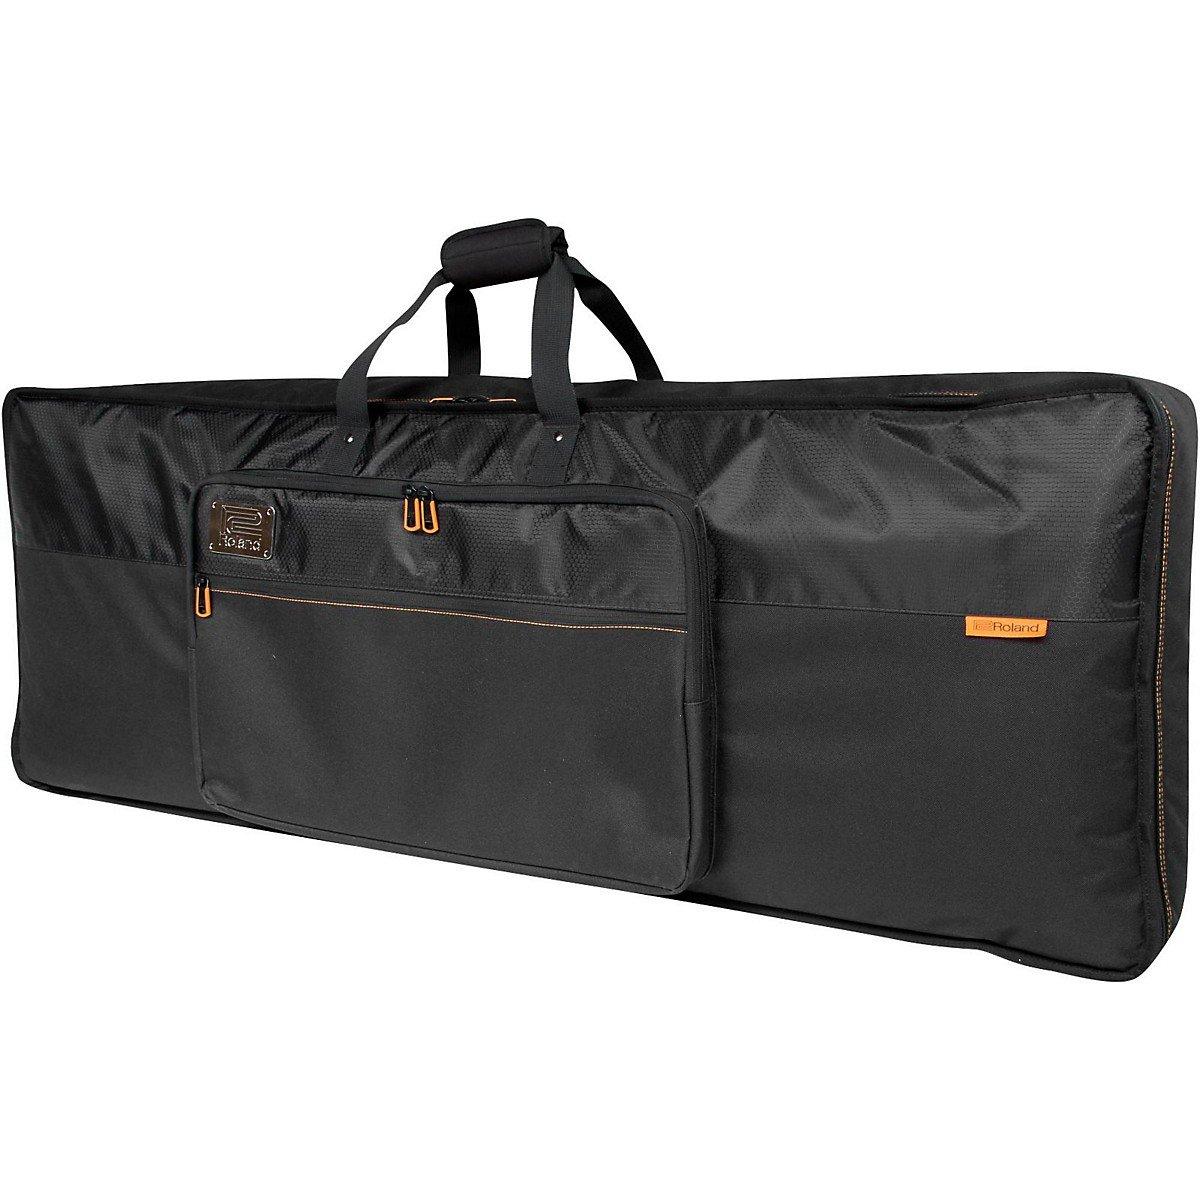 Roland CBB61 Keyboard Bag with Backpack Straps, 61-key, Black Series